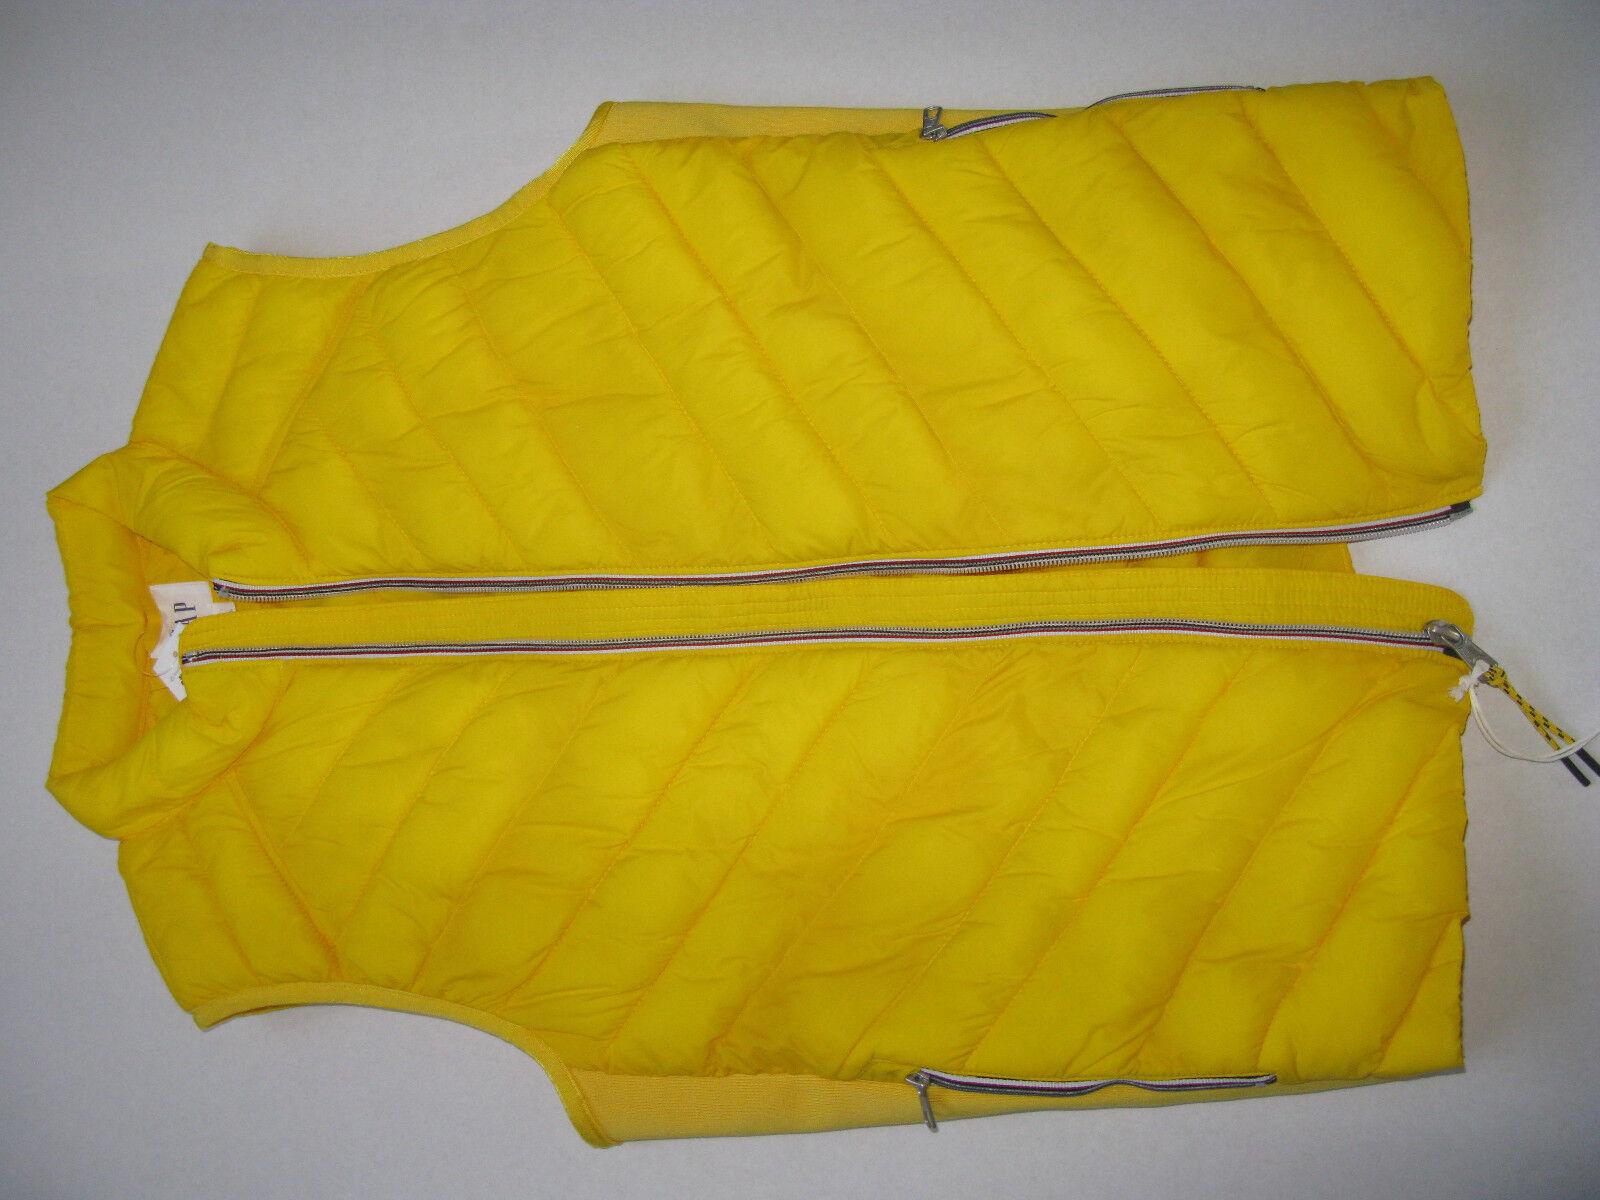 J GAP NEW warmer warm as 500 fill fill fill down fleece yellow water resistant waistcoat M 32bf3d